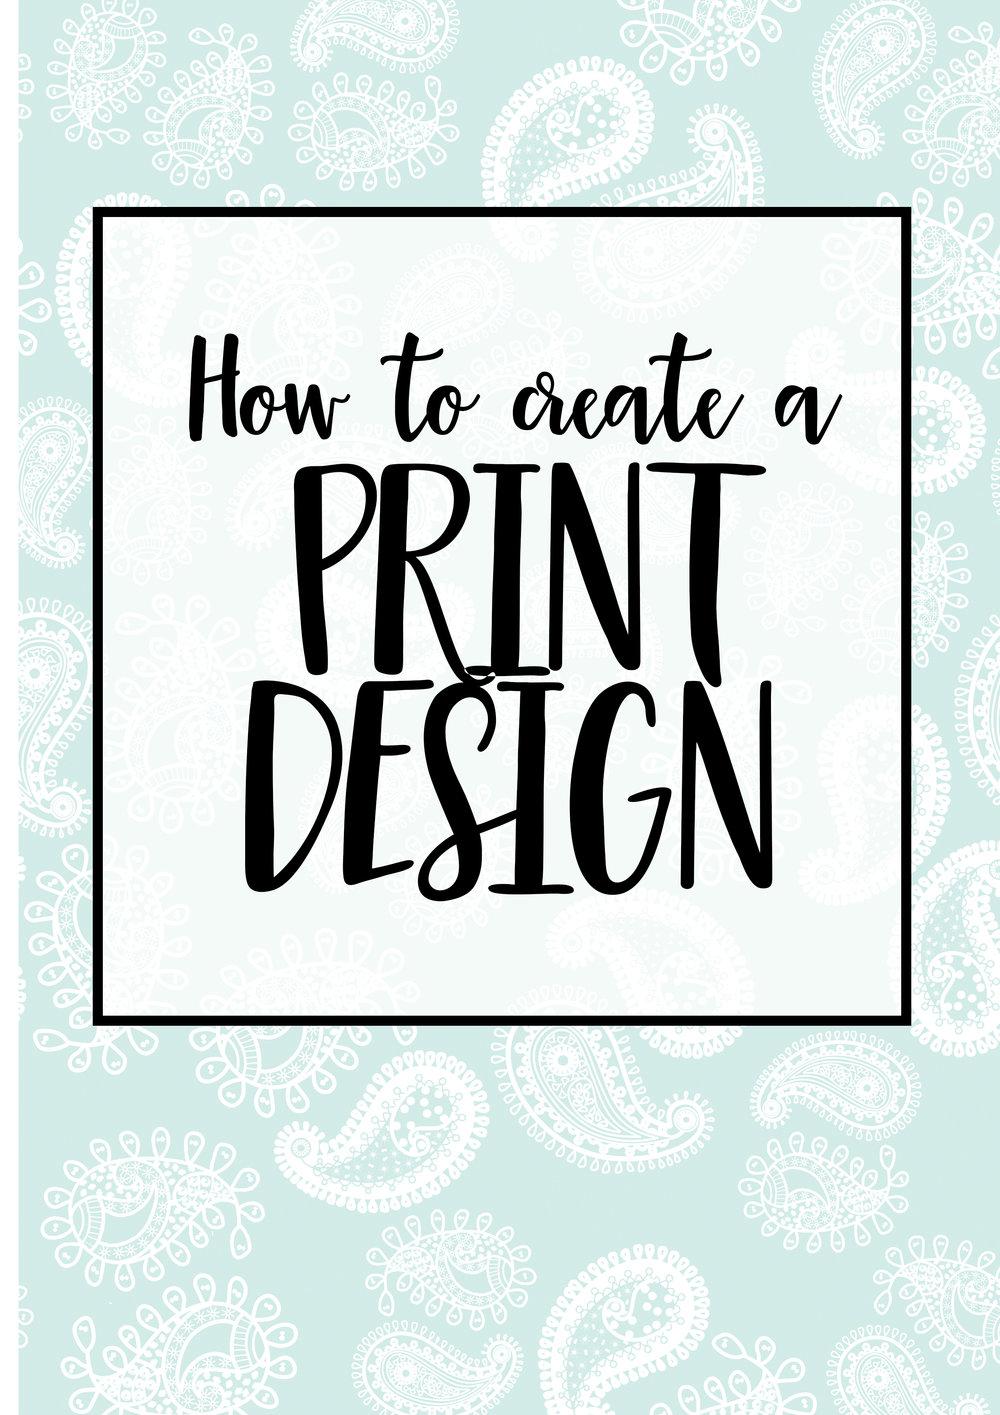 How to create a print design